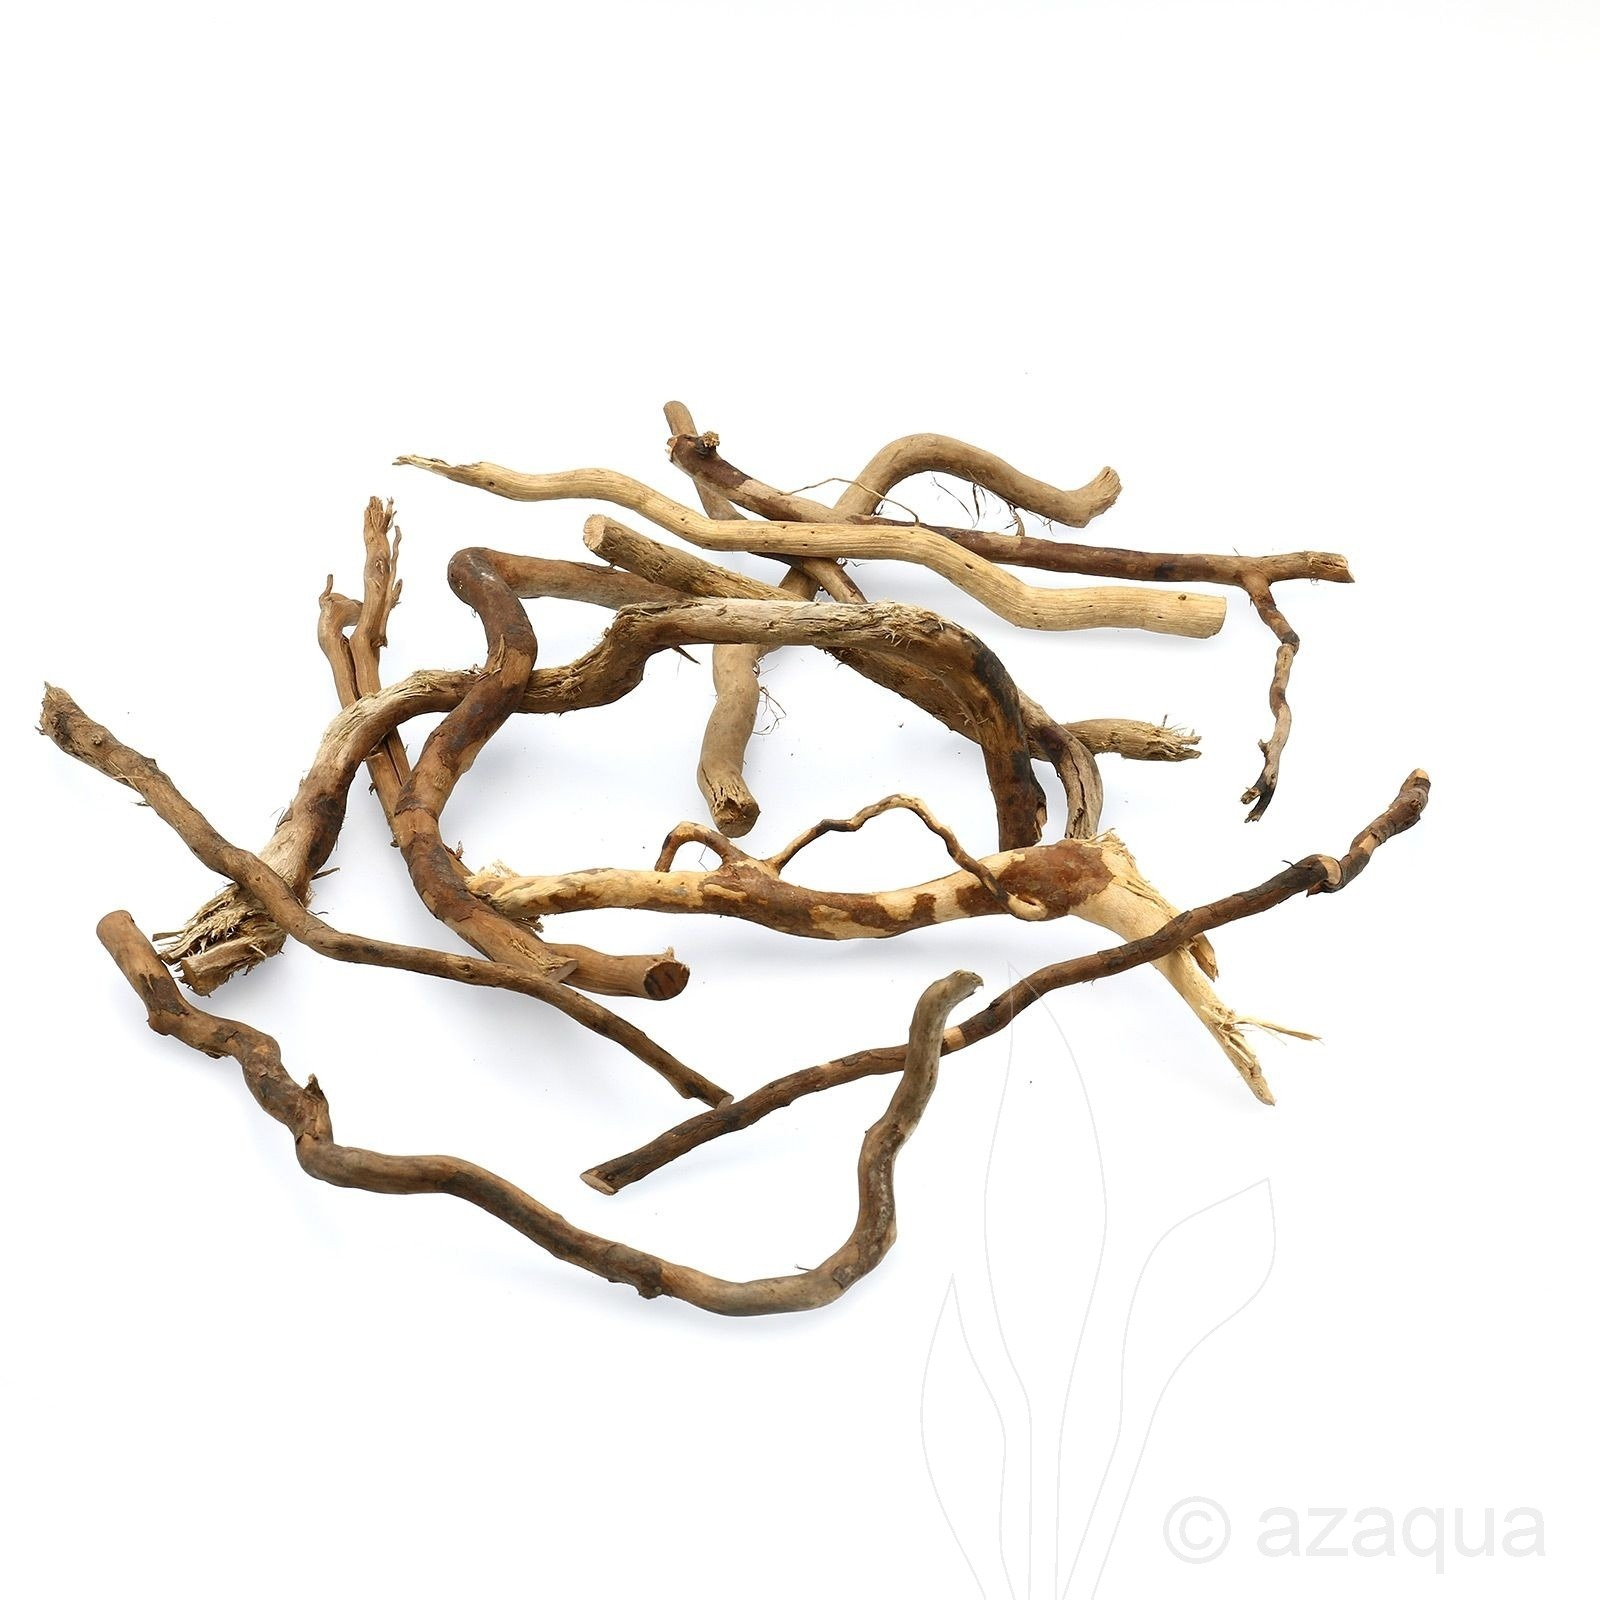 Spiderwood Twigs 15-25cm 100 gram